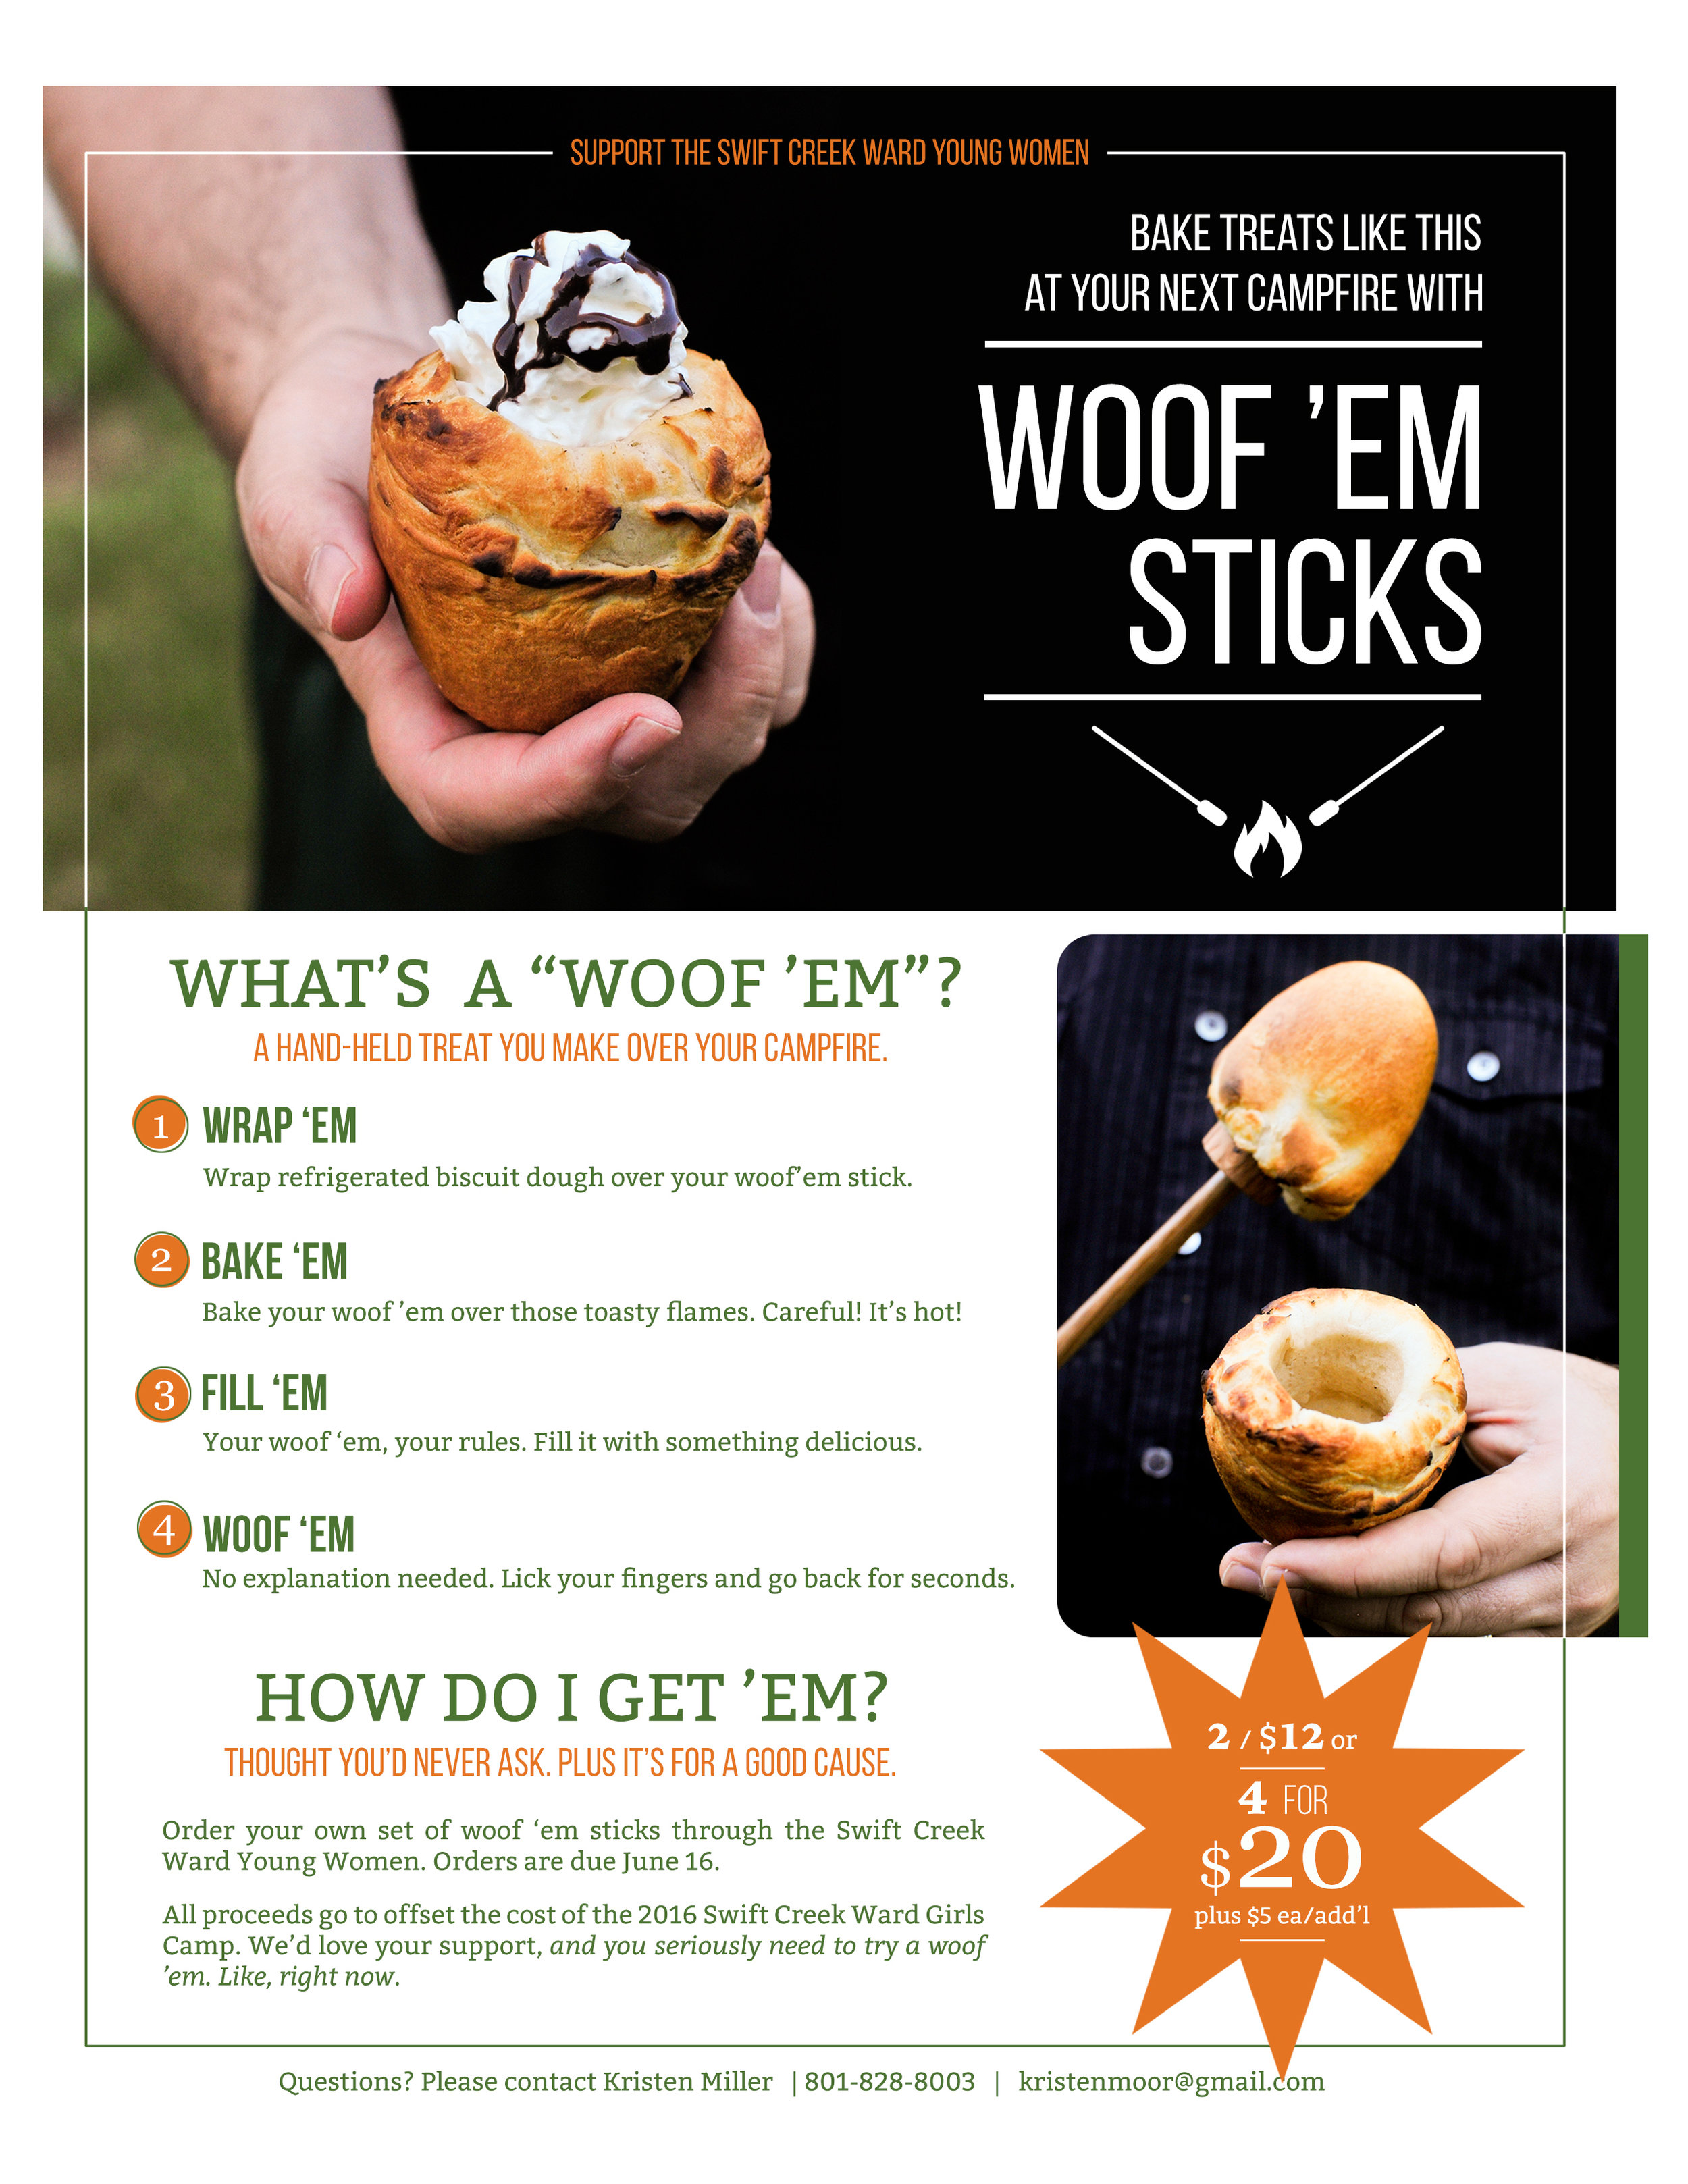 WoofEmSticks8x10.jpg